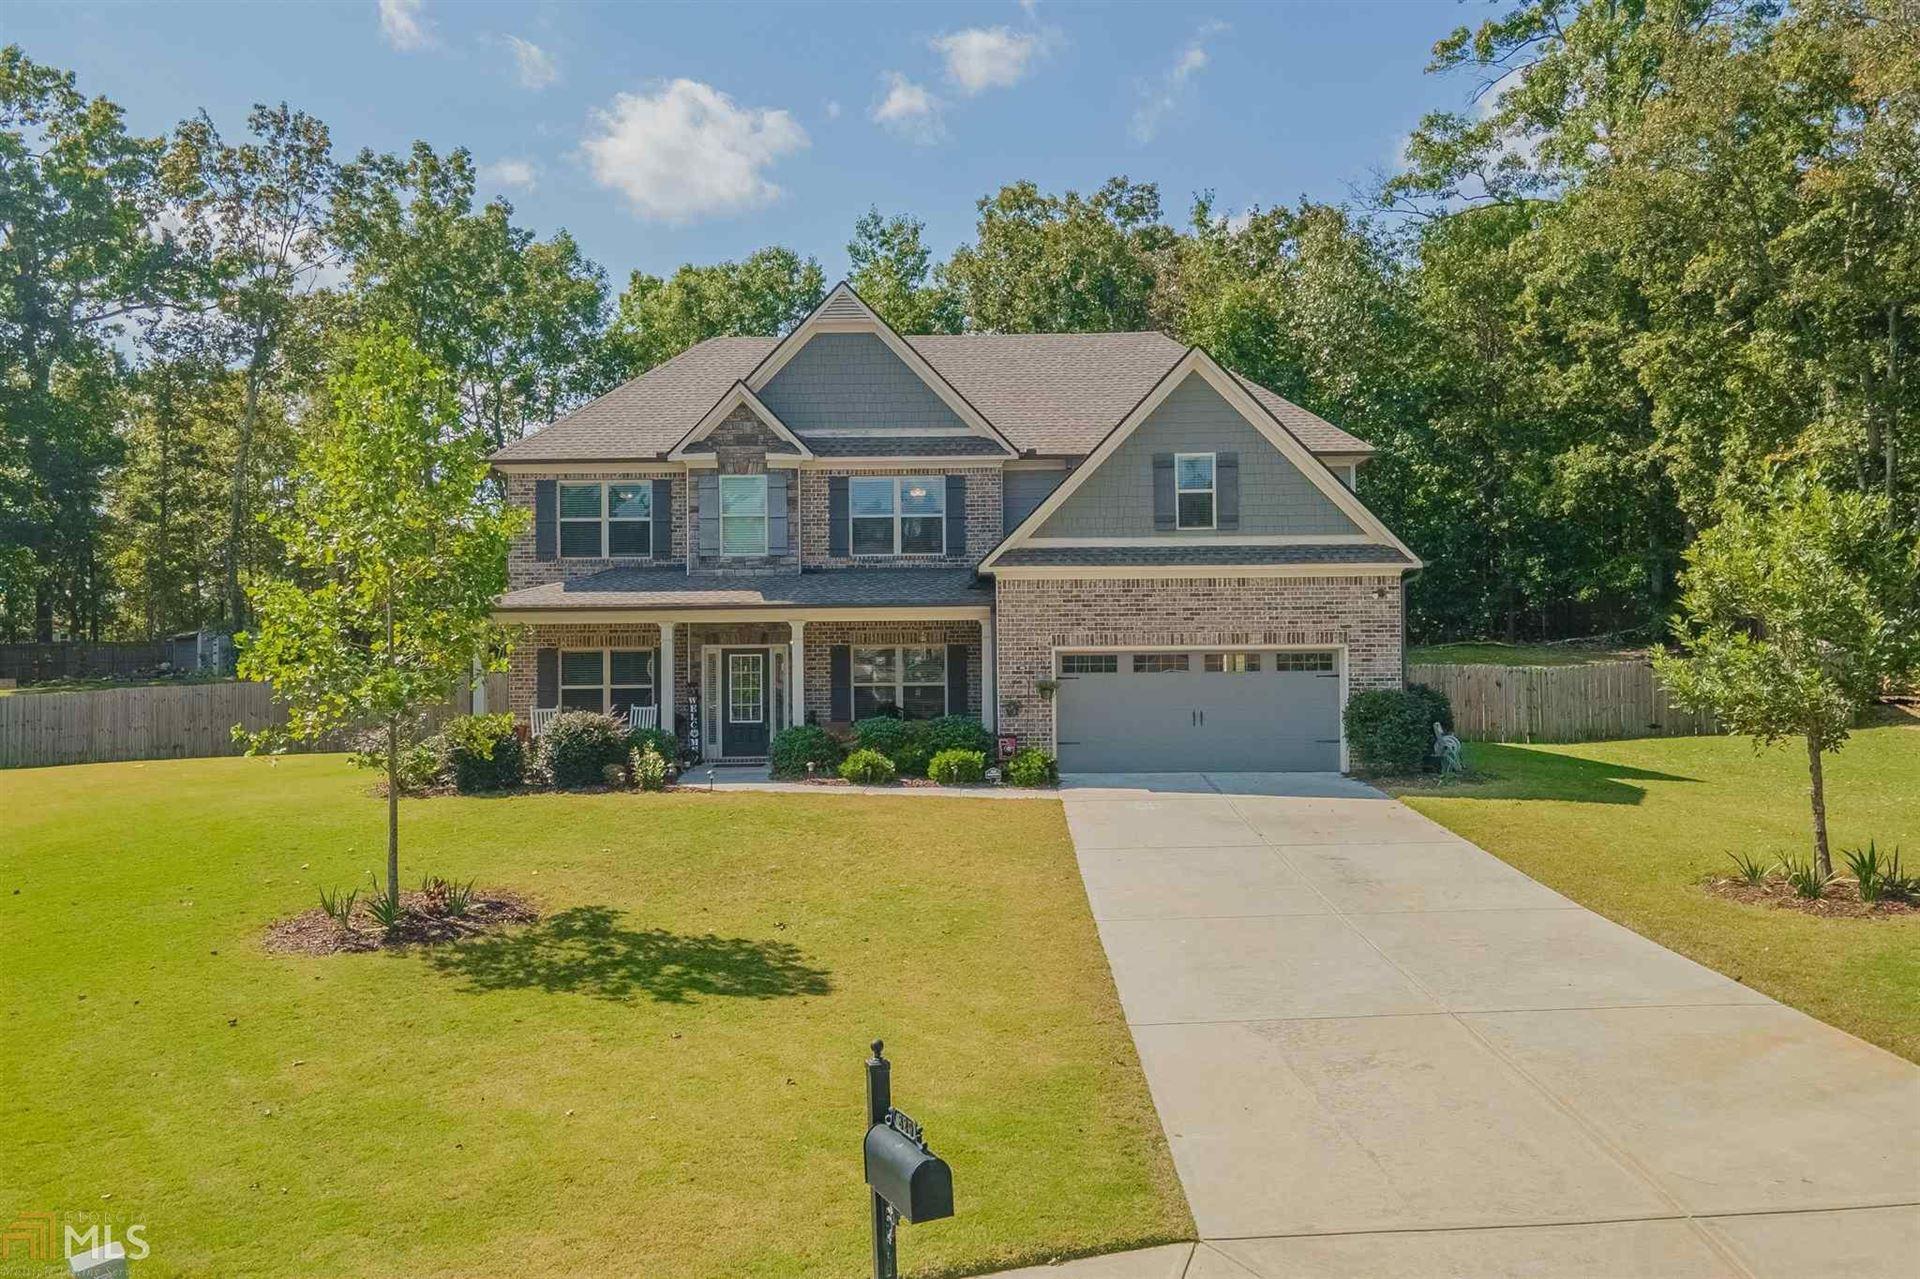 829 Willow Grass Ct, Covington, GA 30014 - #: 8869699